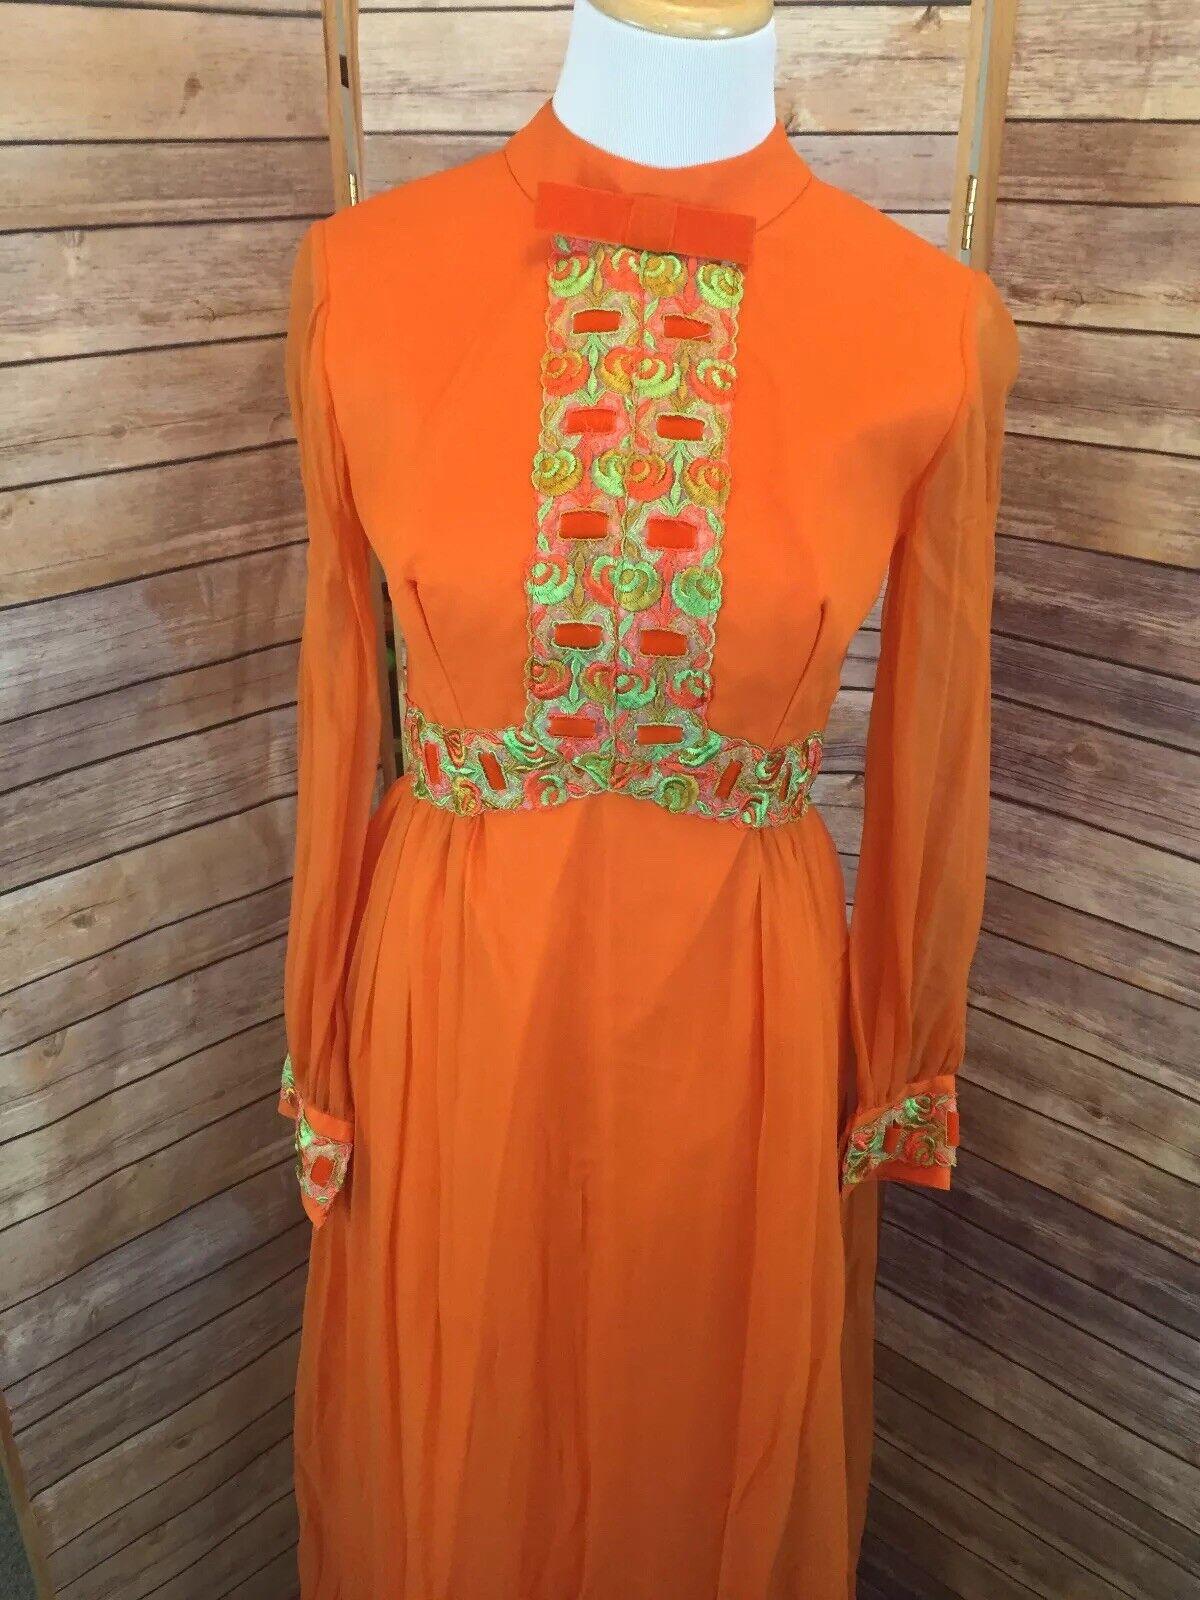 VTG 70's 1970s Psychedelic orange OOAK Embroidered Sheer Overlay Long Dress Sz 9